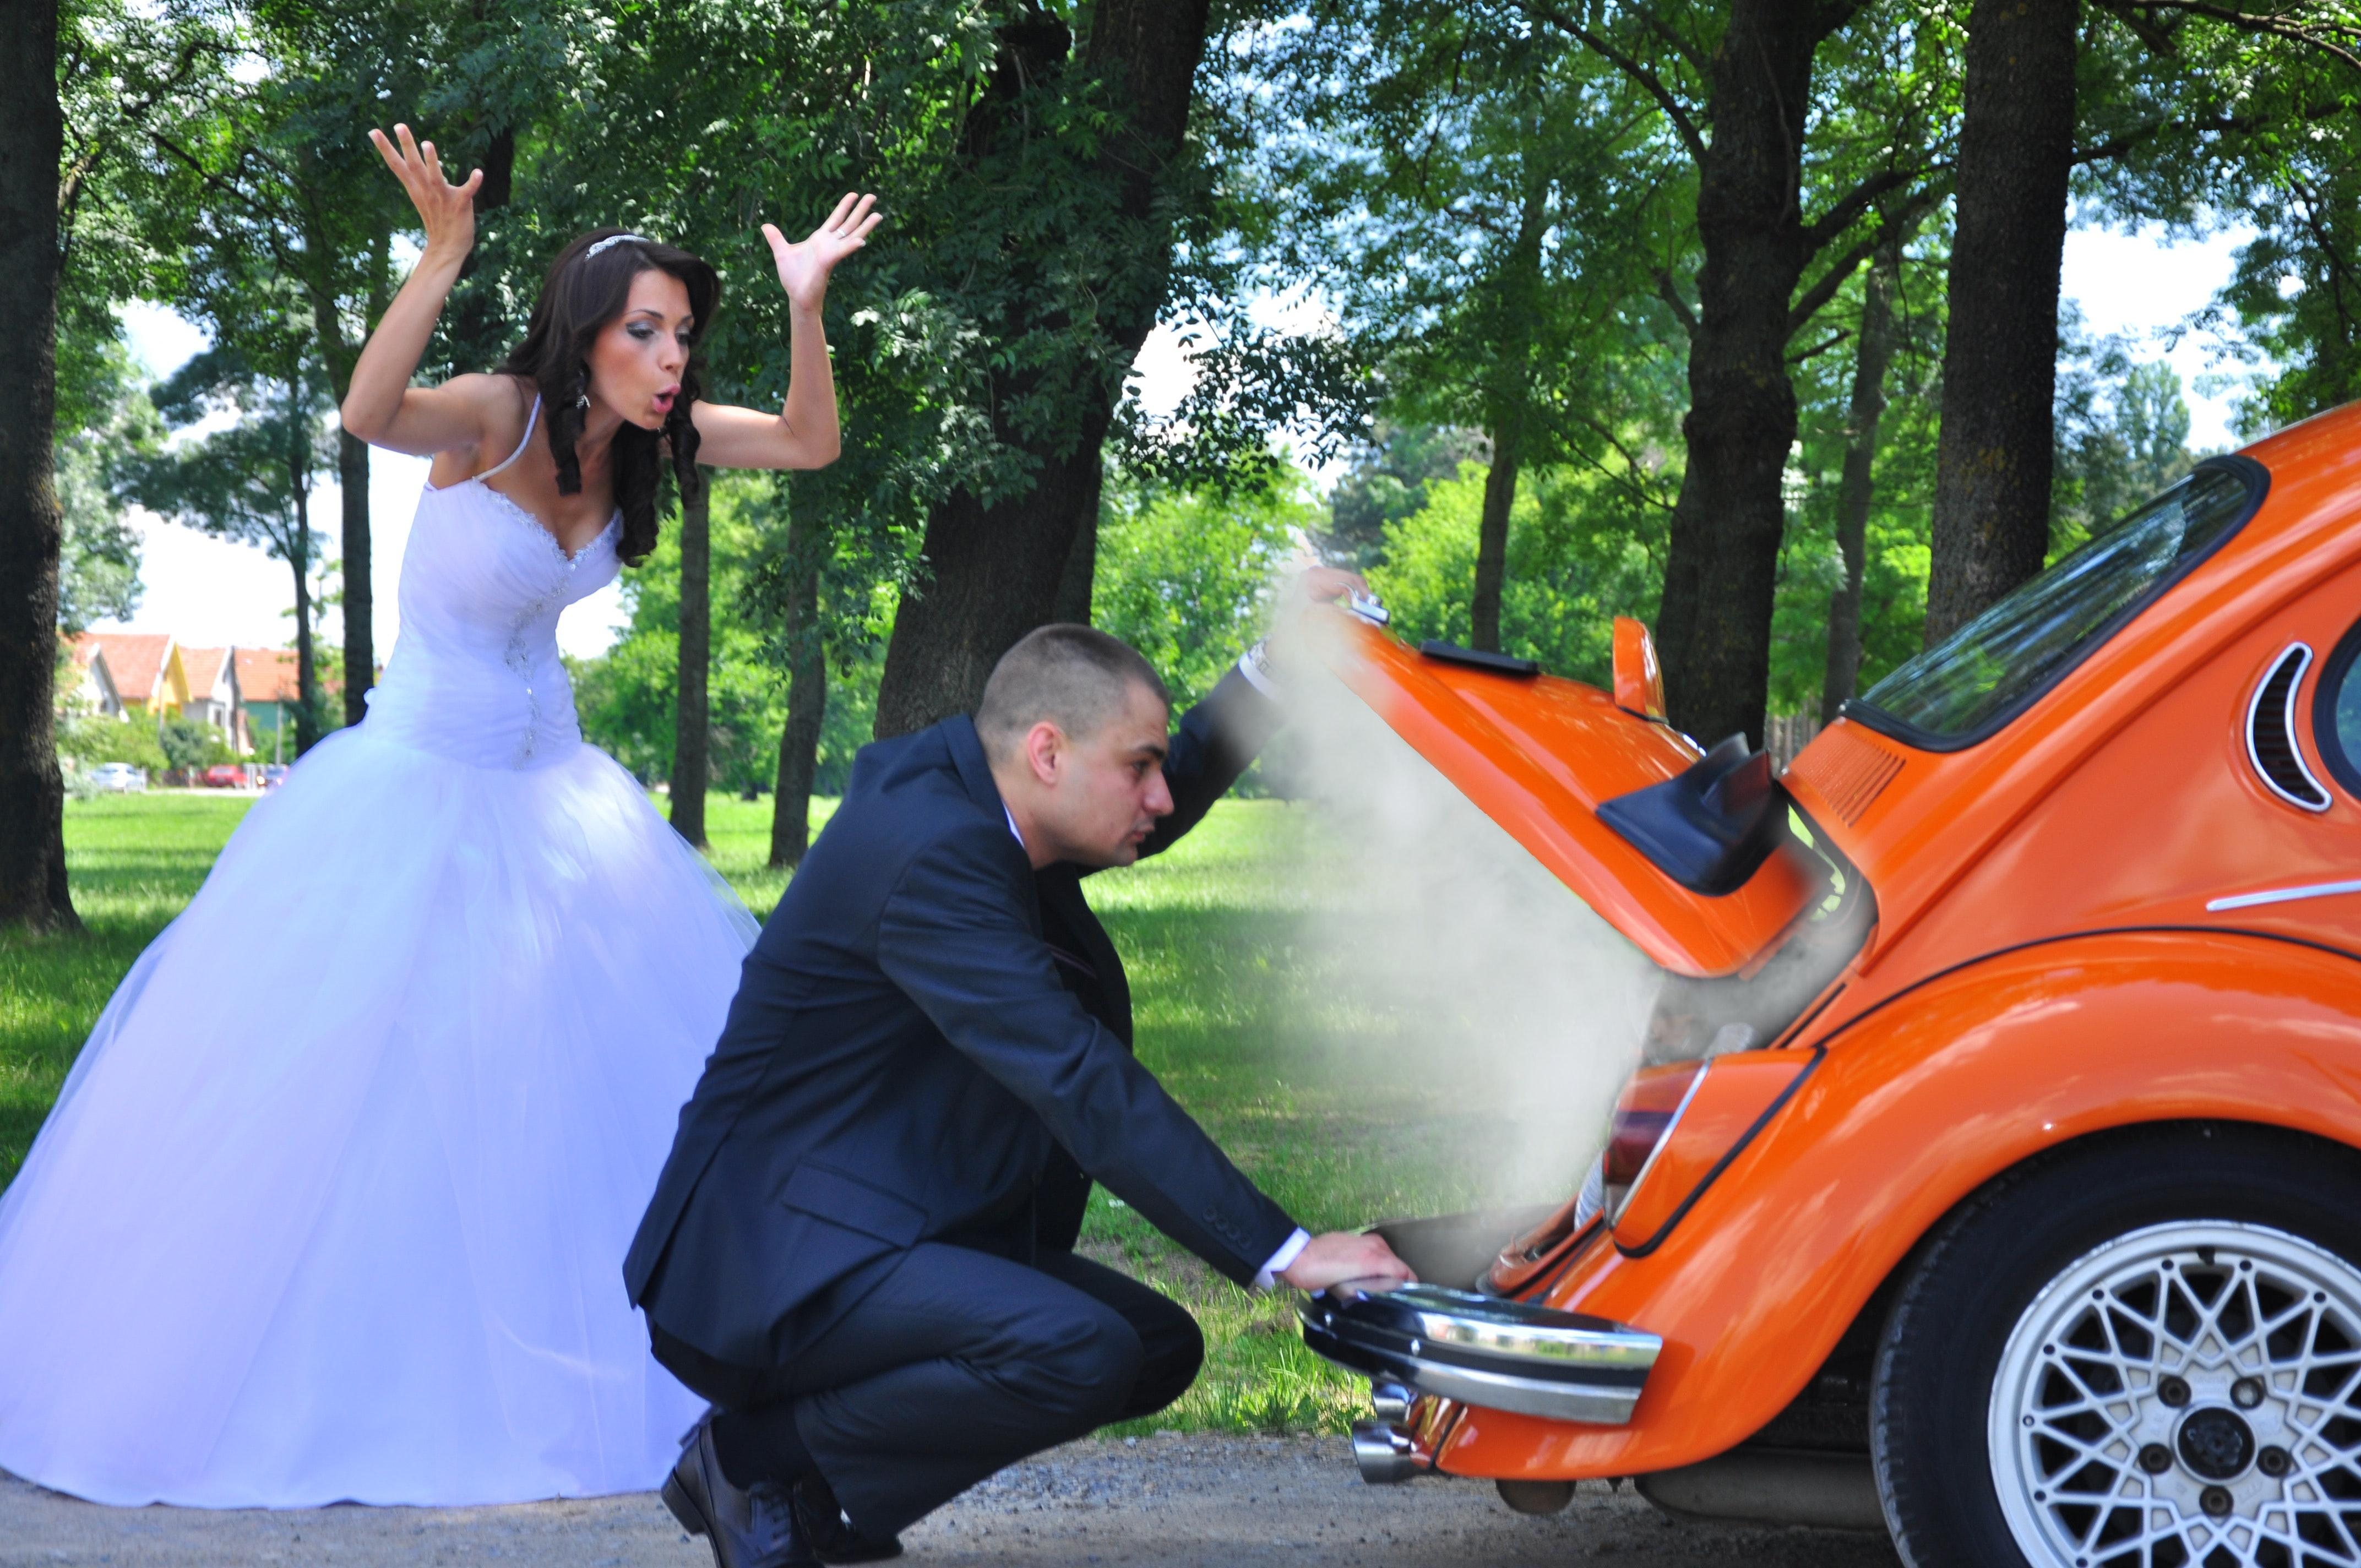 Woman in white wedding gown near orange car photo